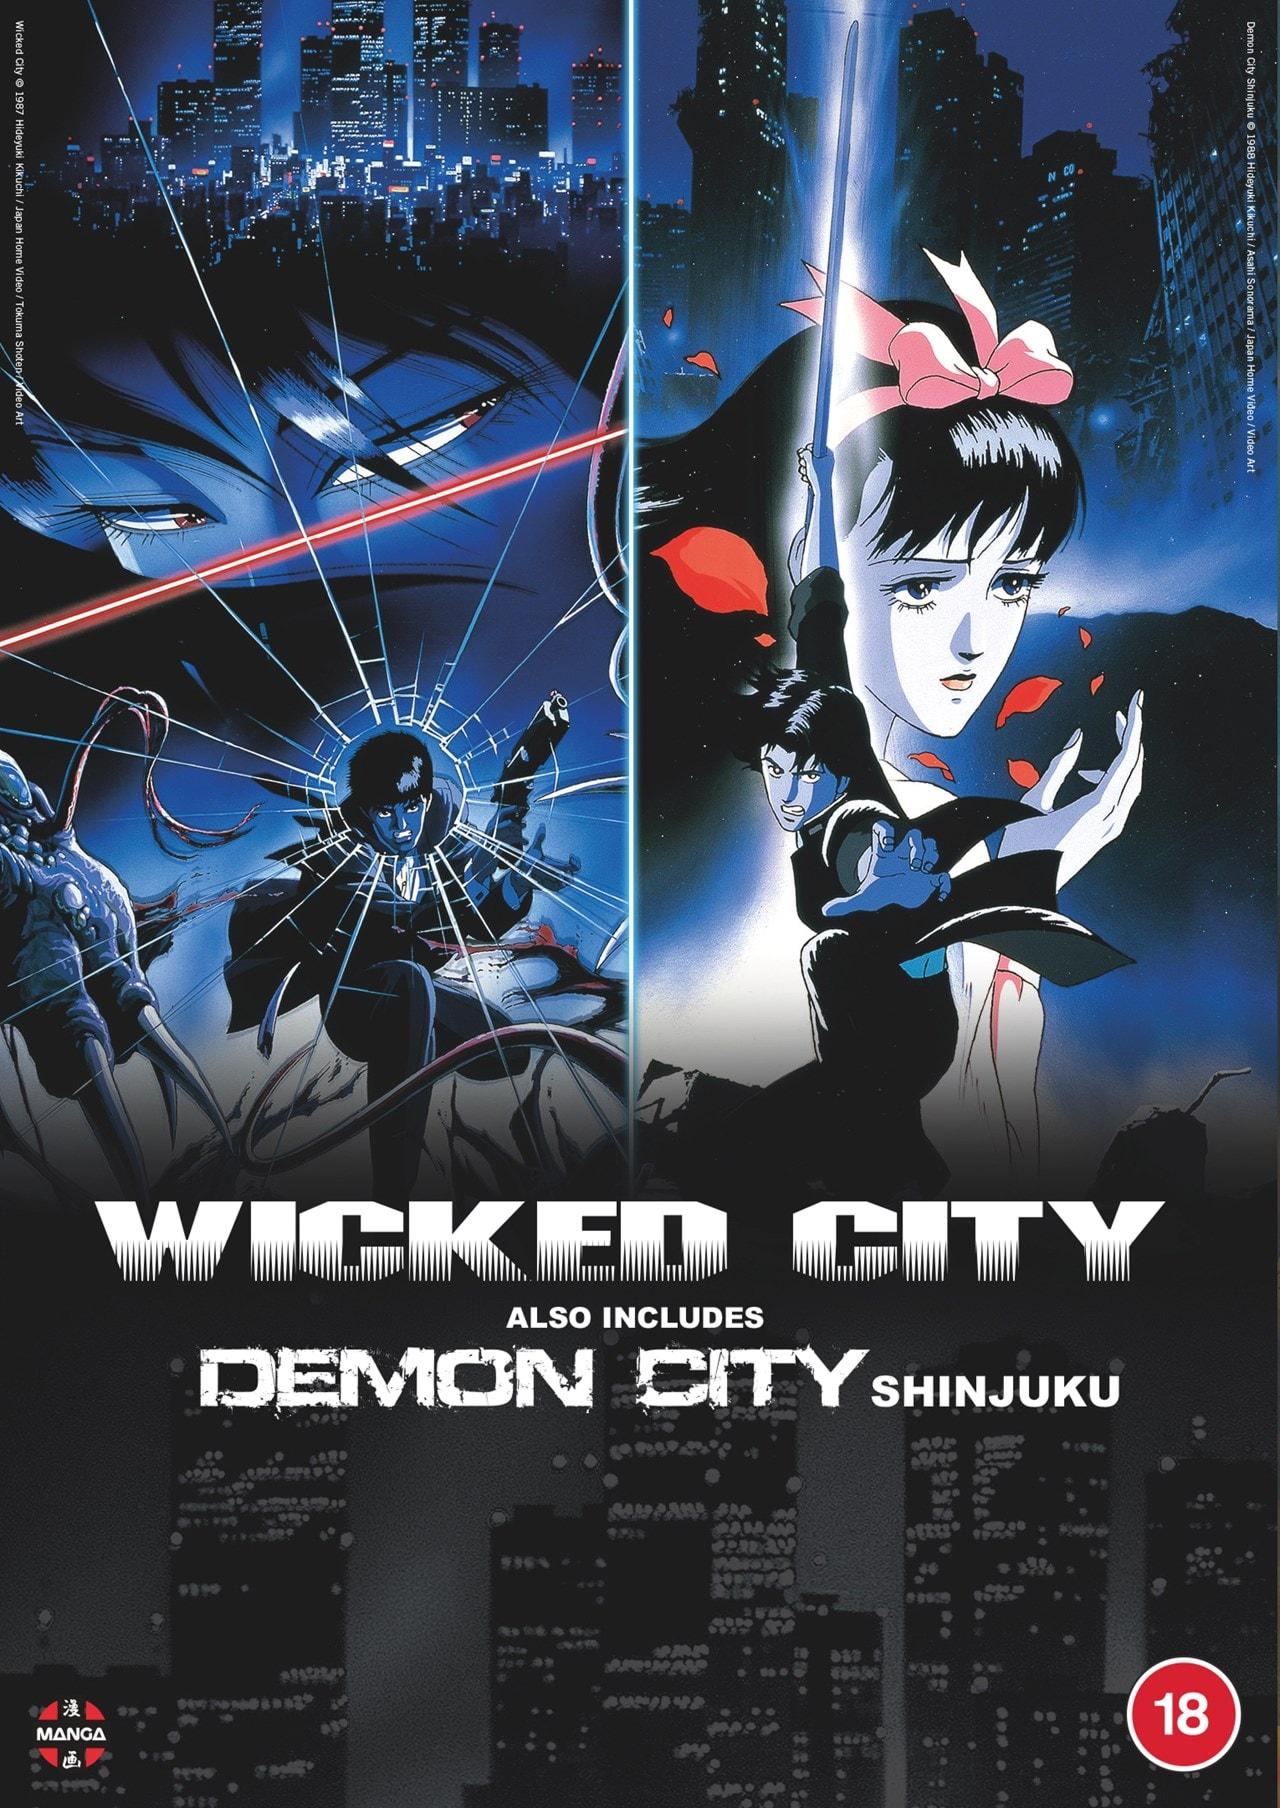 Wicked City/Demon City Shinjuku - 1